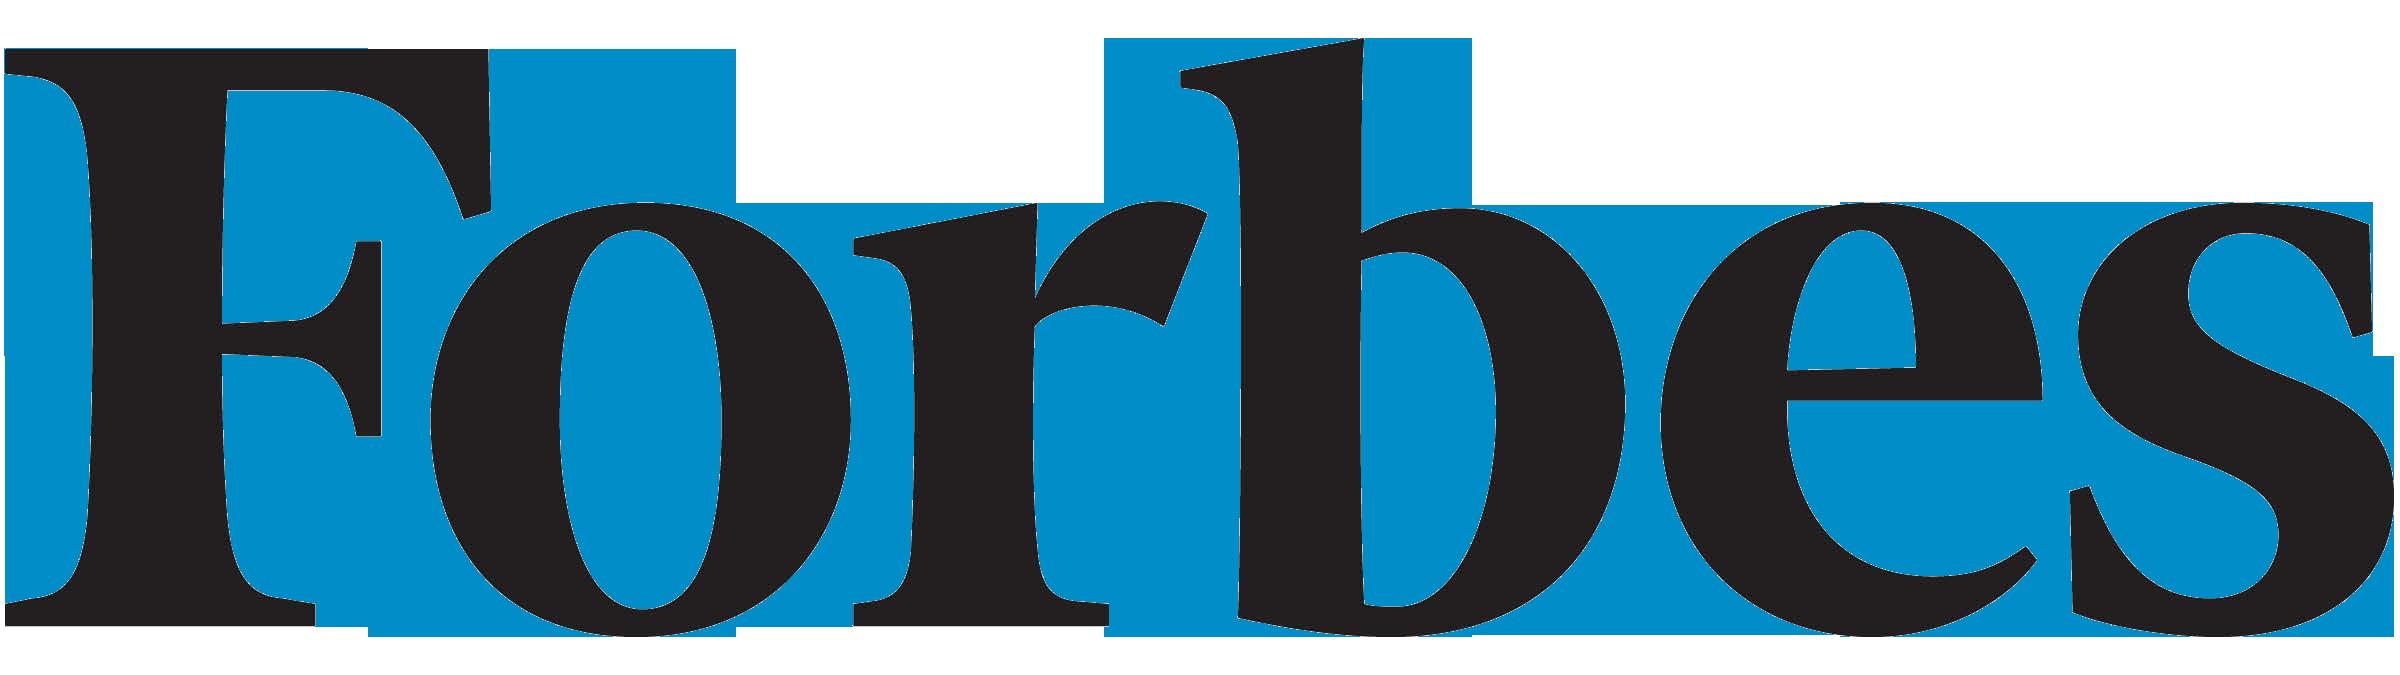 Forbes_logo_1_